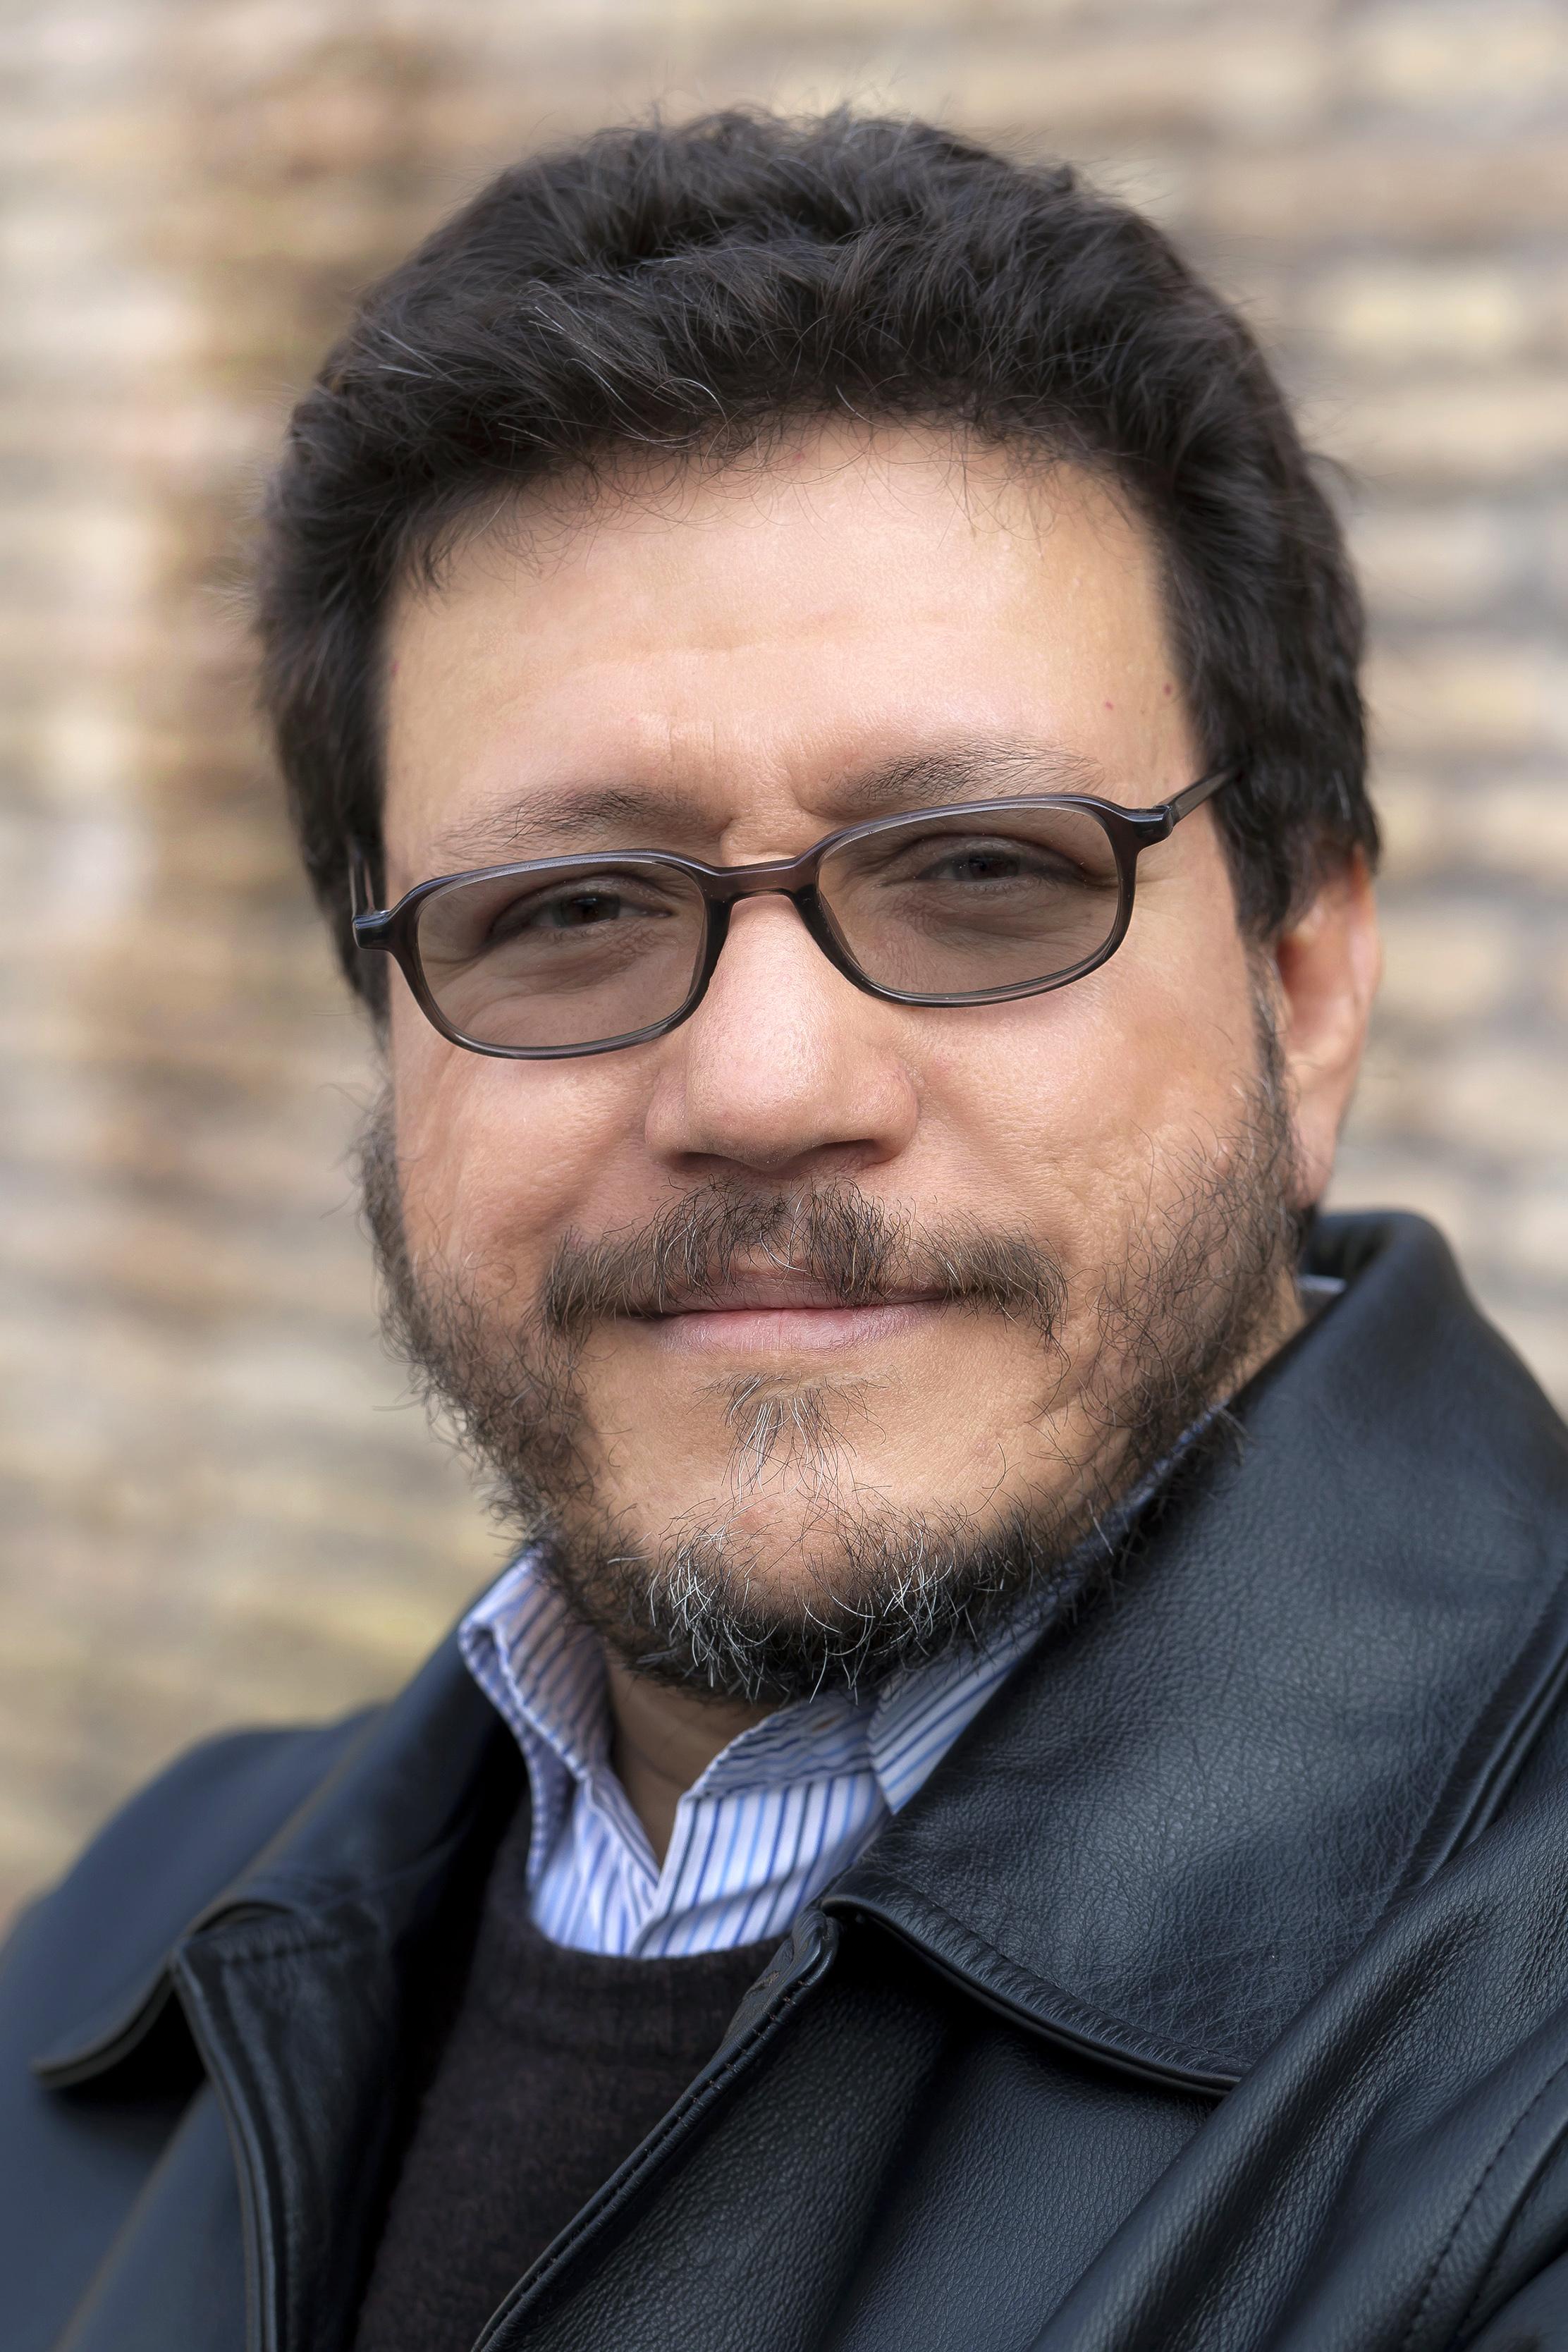 Le syndrôme d'Ulysse - Santiago Gamboa